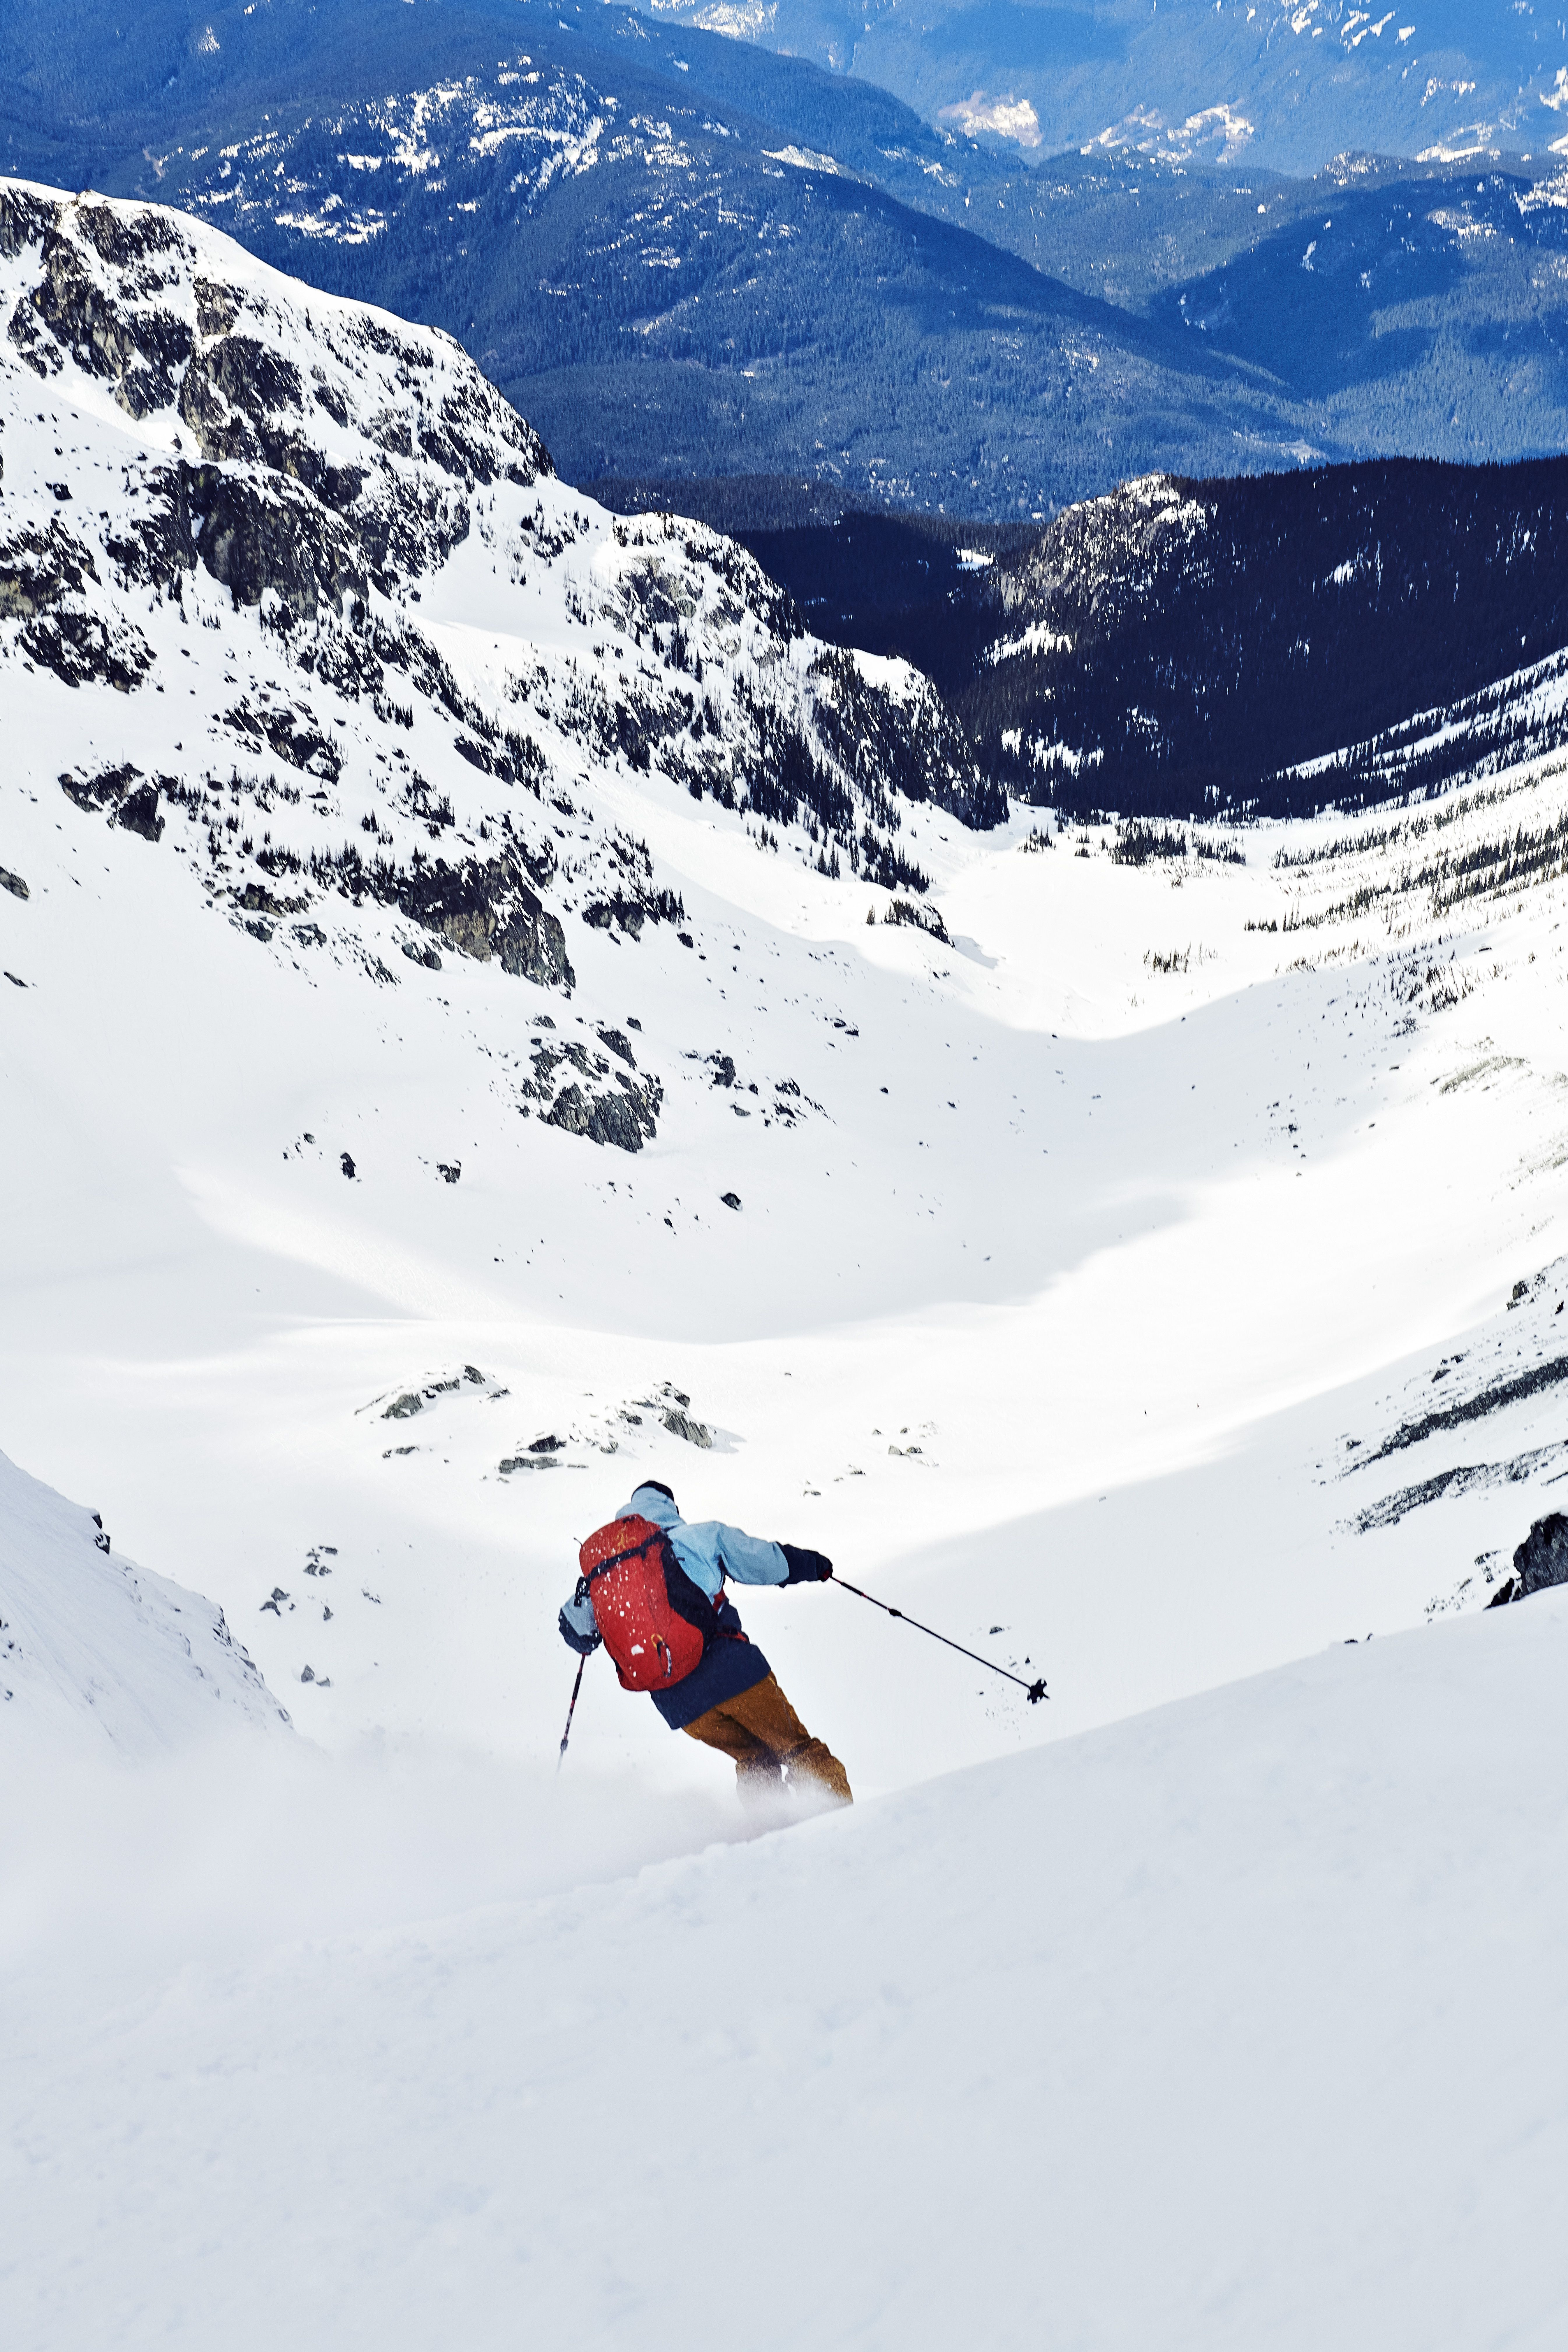 Skiing Whistler in Arc'teryx Whiteline collection. Skiing